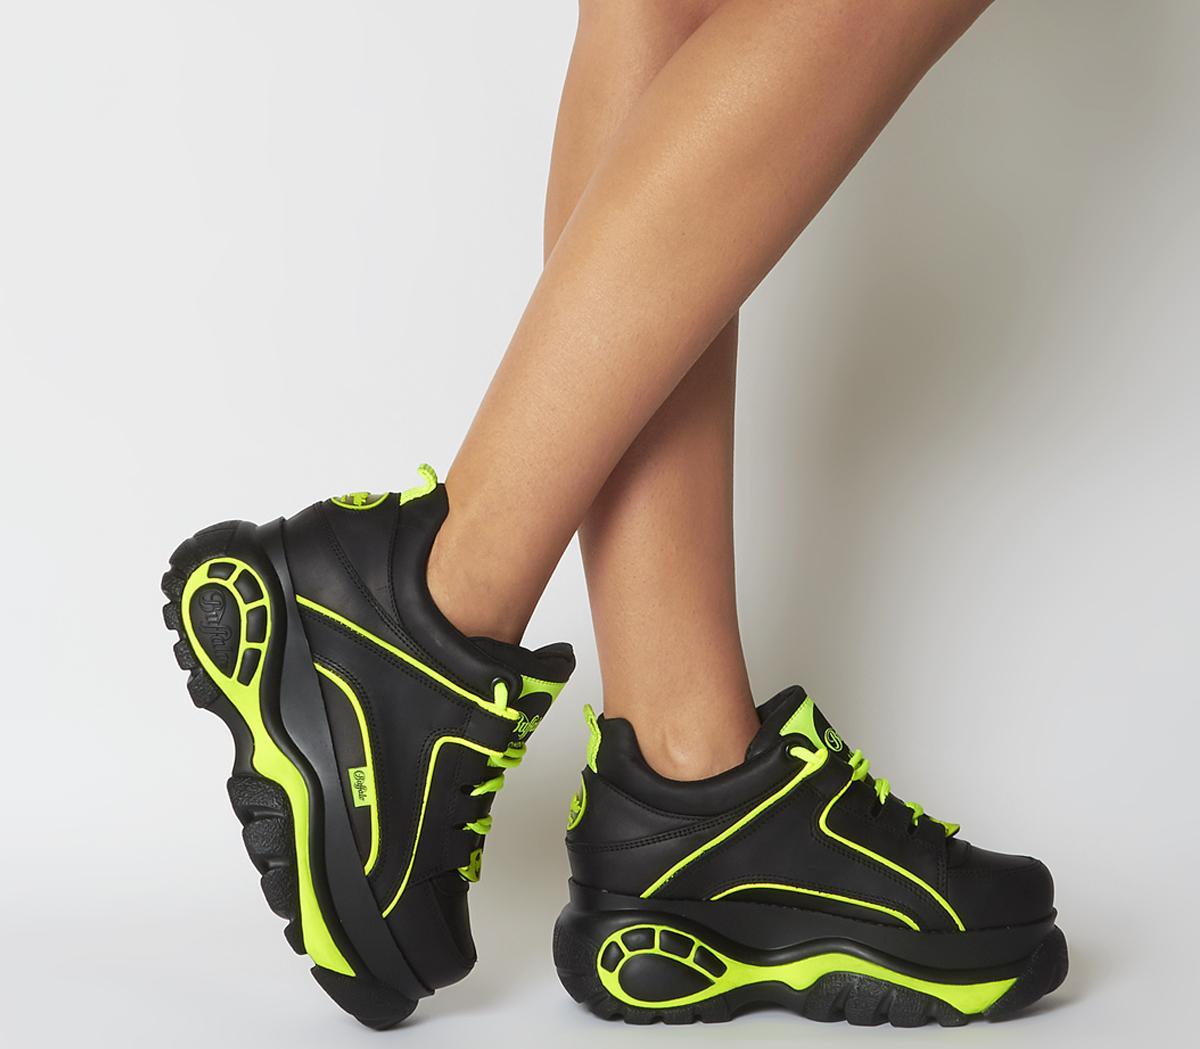 Low Sneakers Black Neon Green